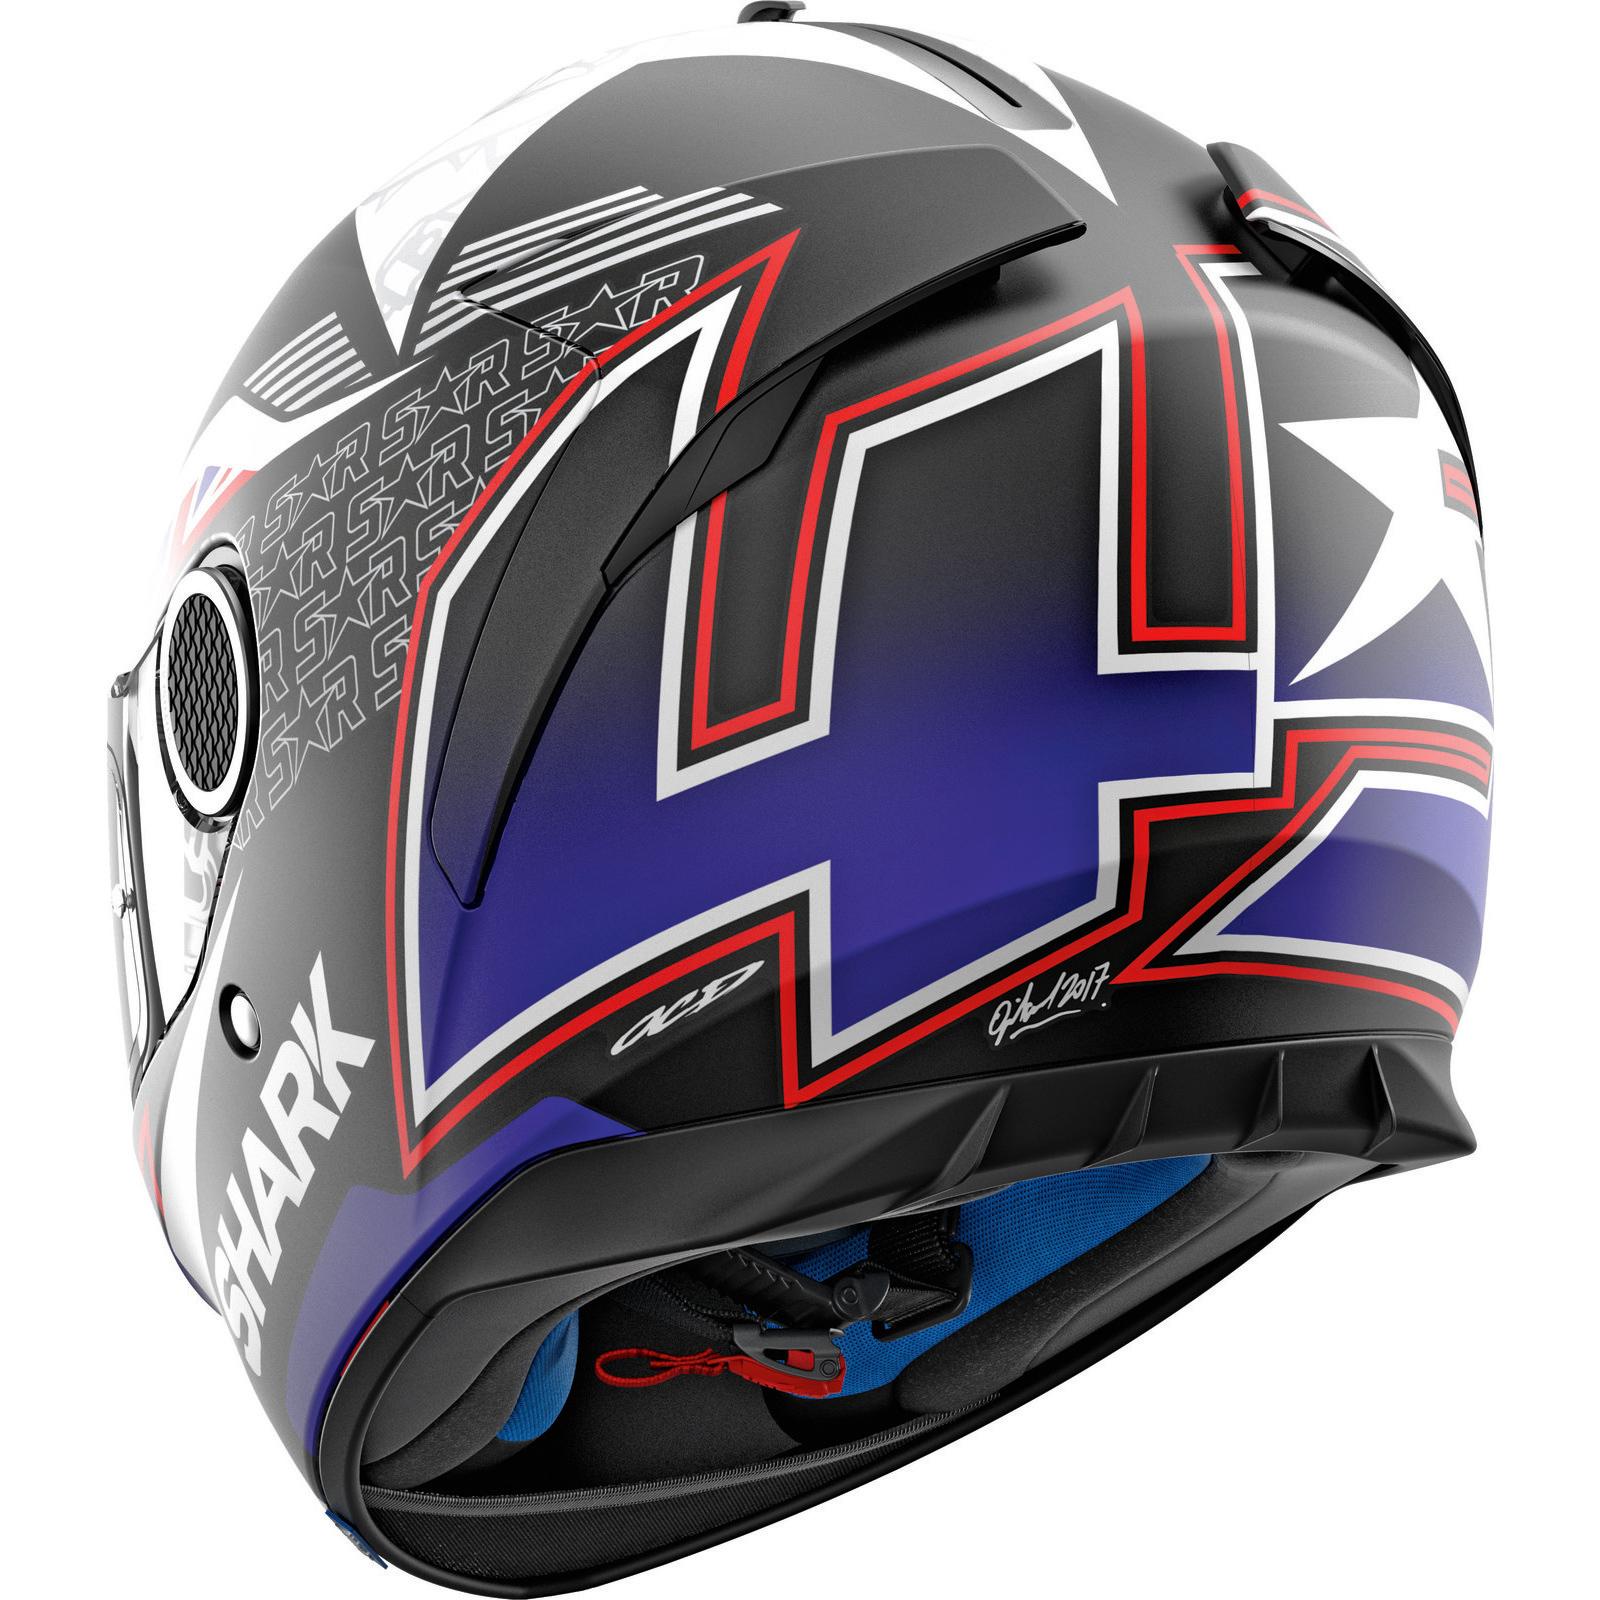 Details about Shark Spartan Redding Black Blue White Motorcycle Helmet KBW  Replica Motorbike